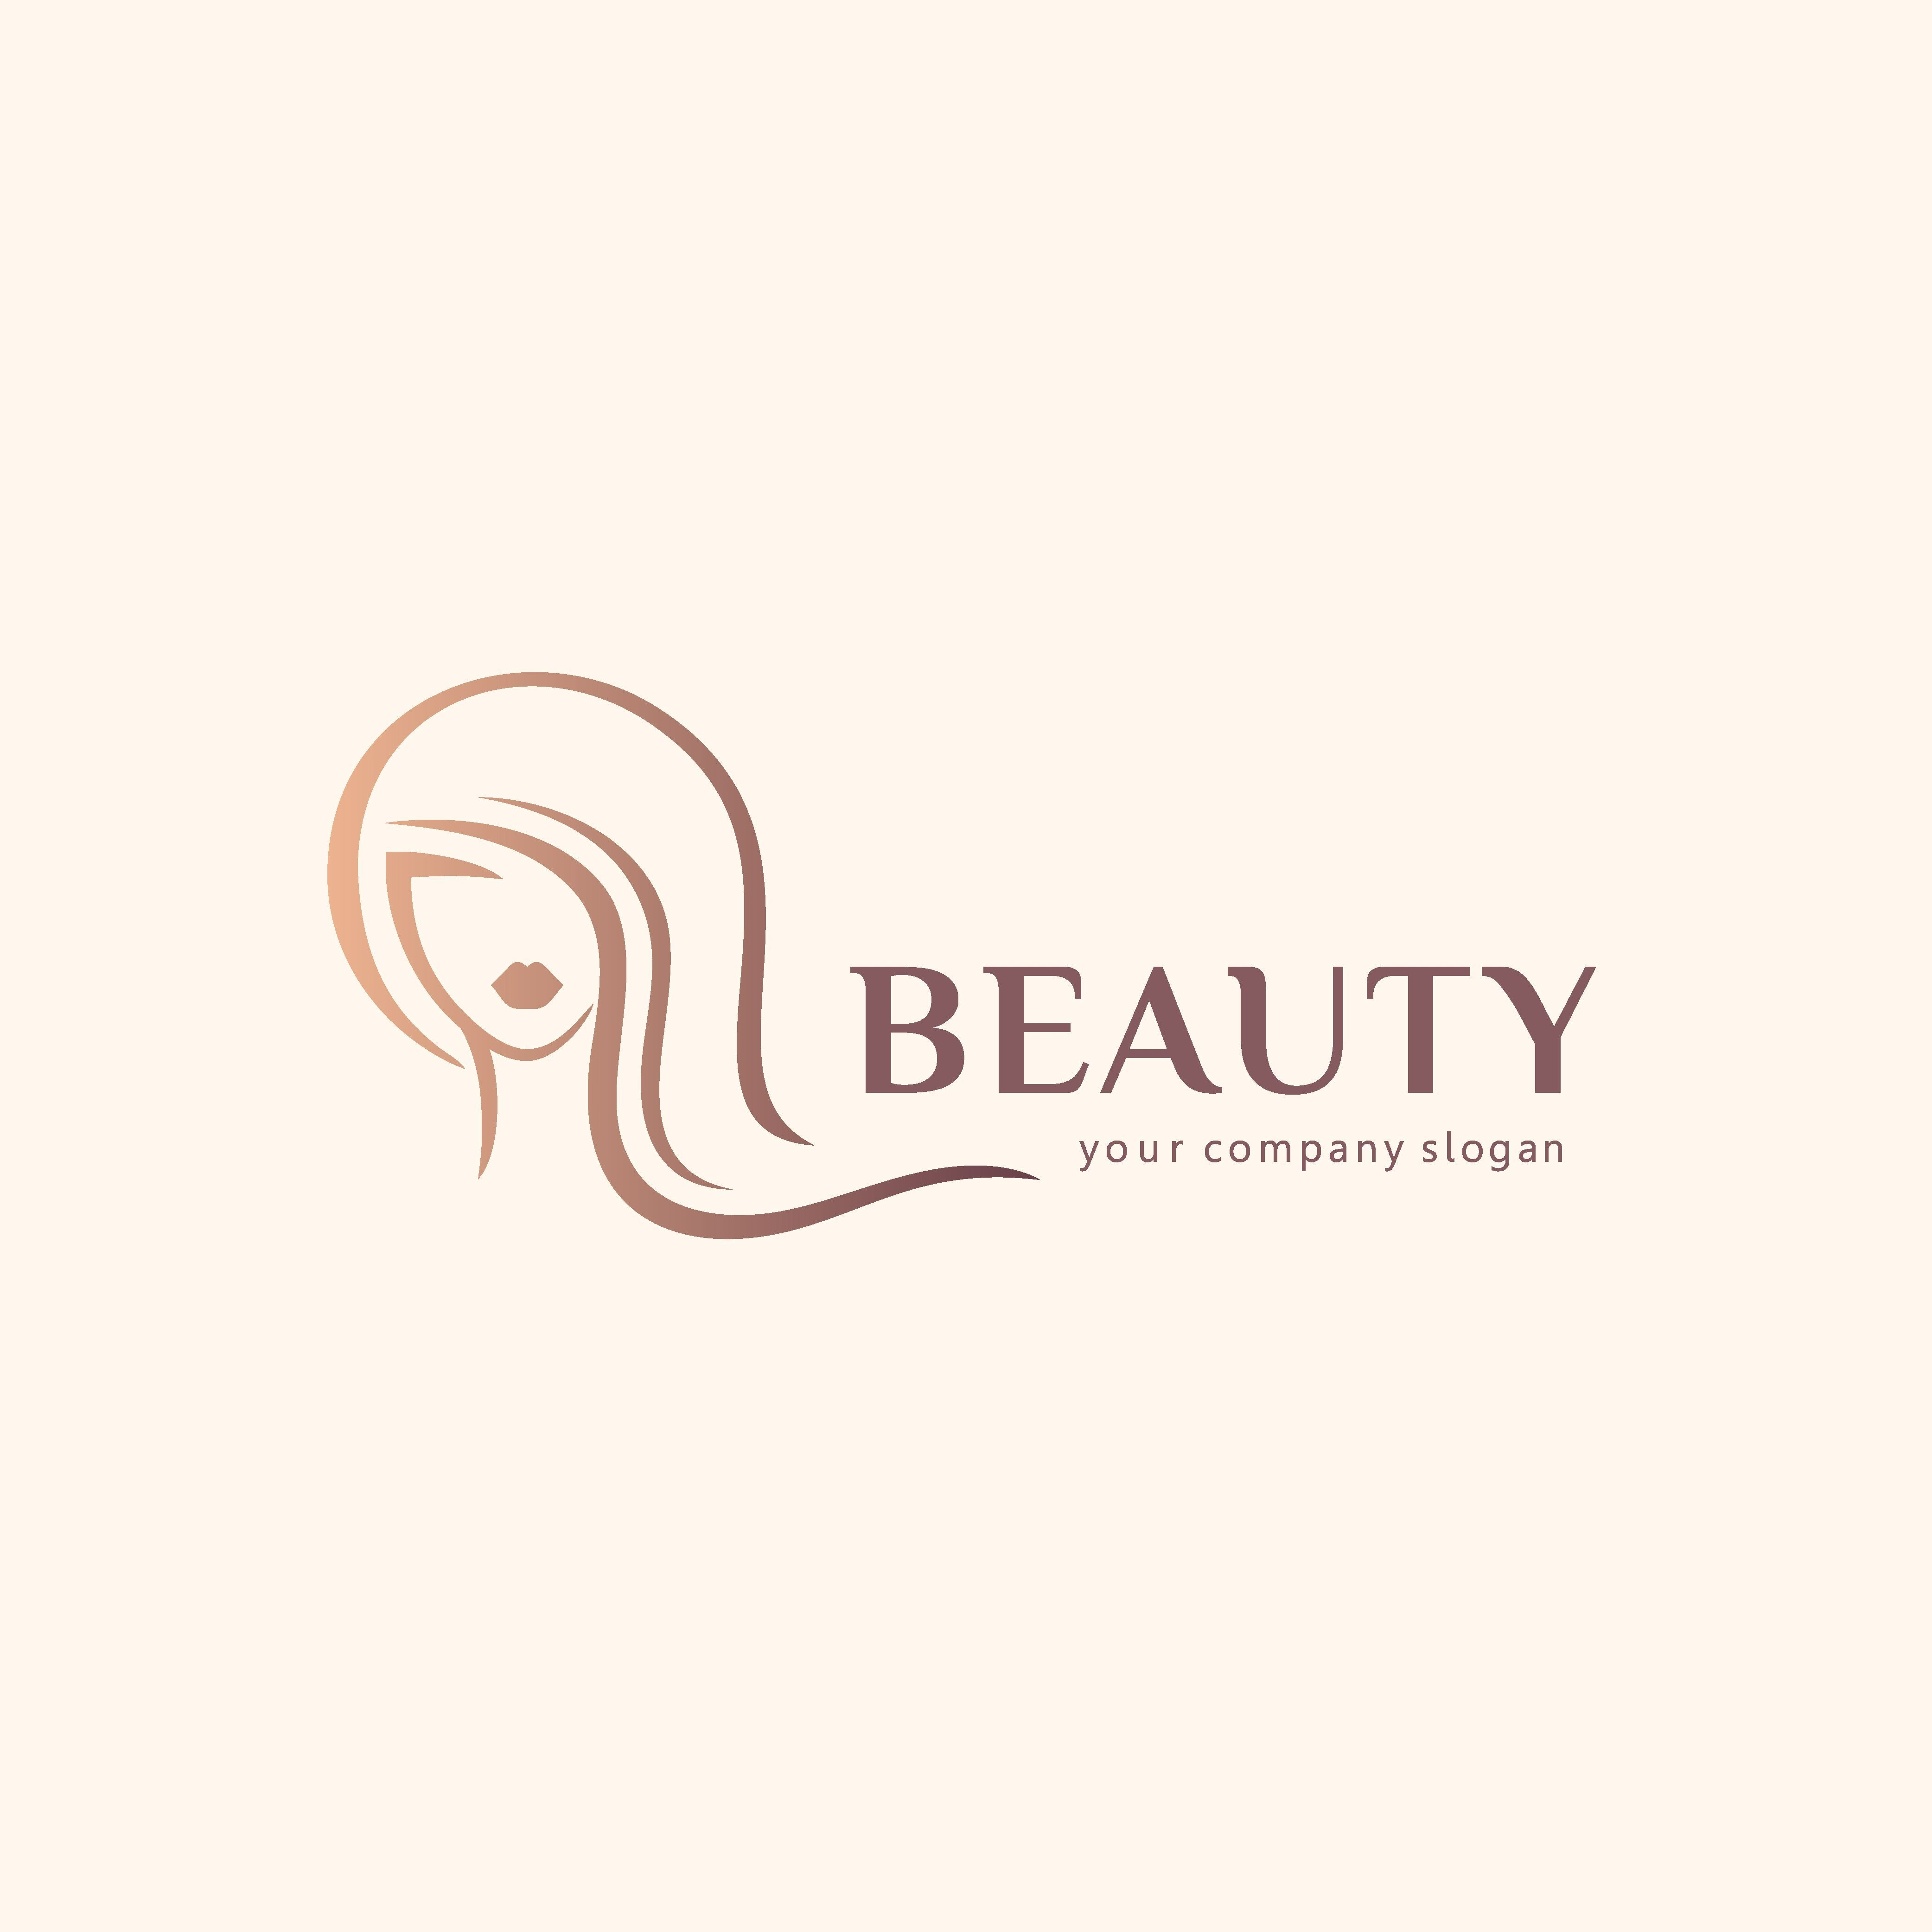 Cosmetic Vector Design Beauty Salon Logo Hair Forvector Logo Design For Beauty Salon Hair Salon Beauty Salon Logo Hair Salon Logos Hair Salon Business